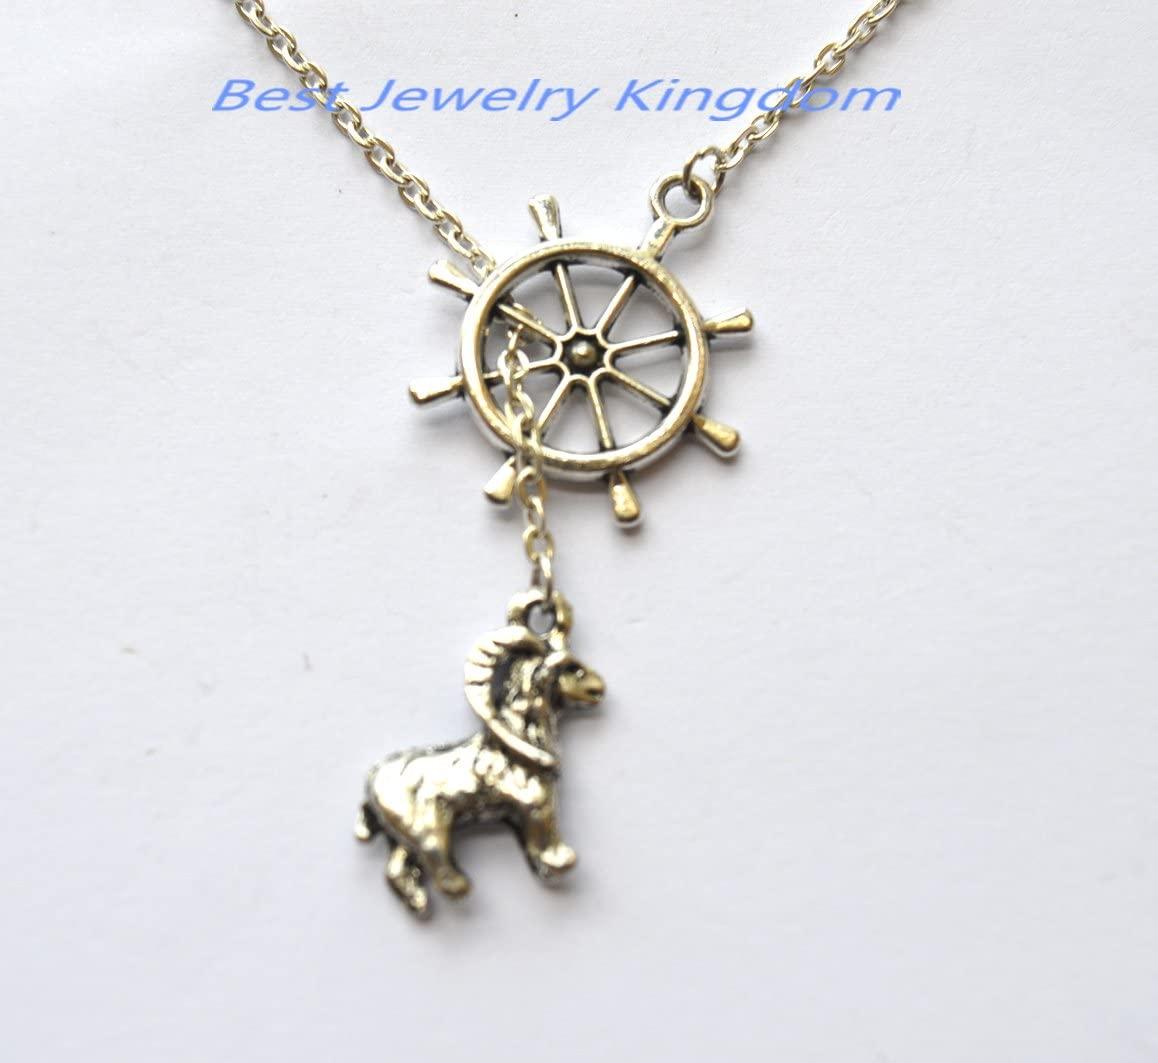 Ship Rudder Necklace -Silver Ship Rudder Charm Necklace,Goat Necklace - Goat Gift - Goat Lover - Animal Lover - Farm Gift